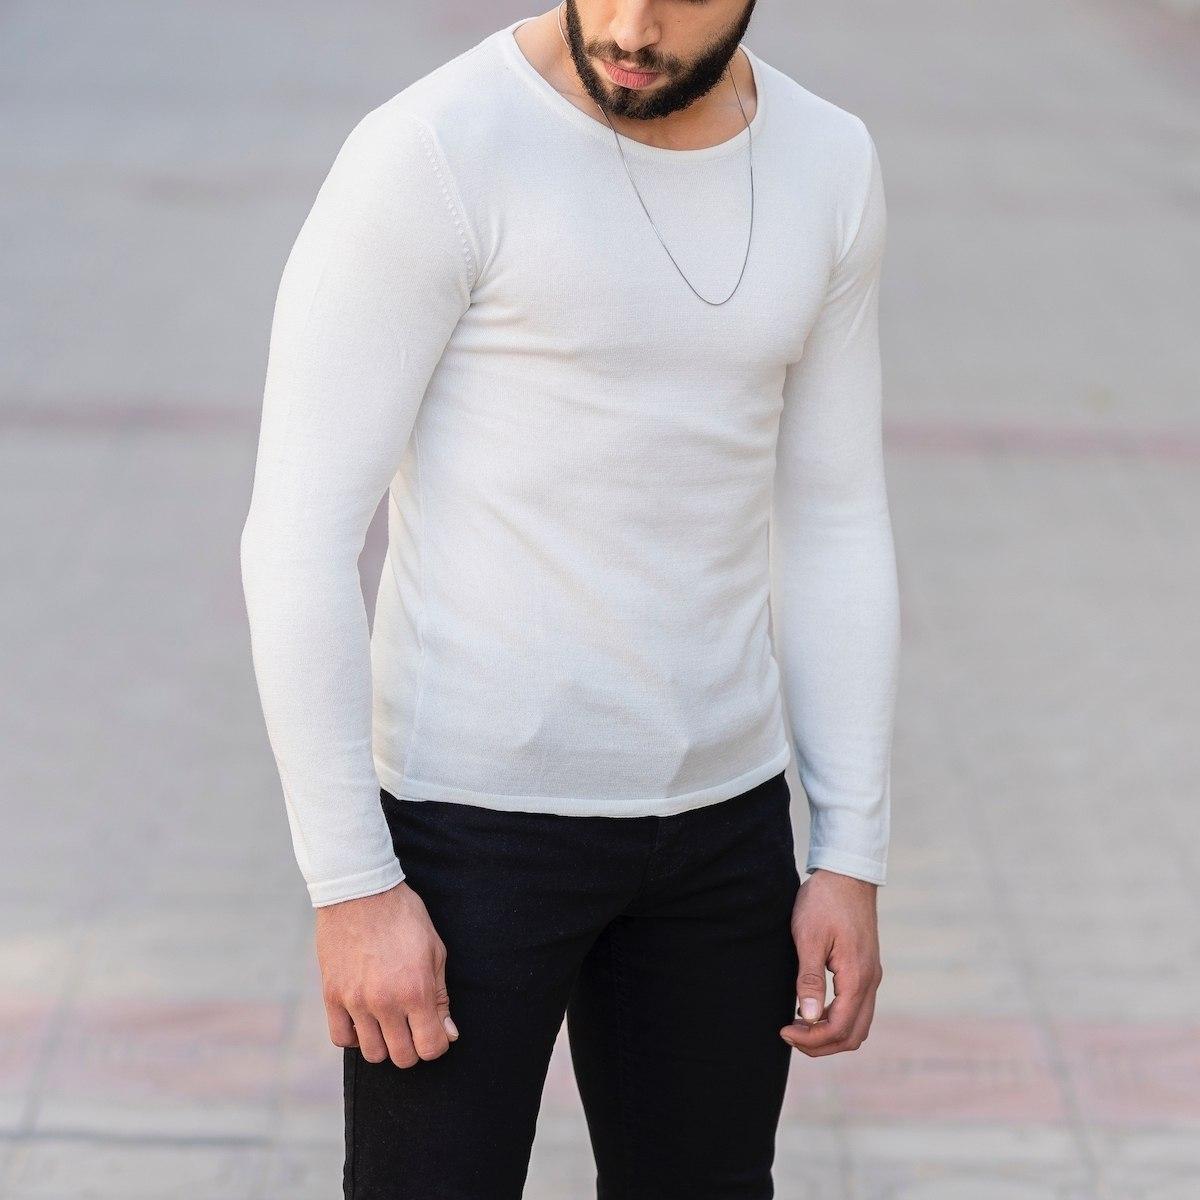 Slim-Fitting Classic Round-Neck Sweater in White Mv Premium Brand - 3